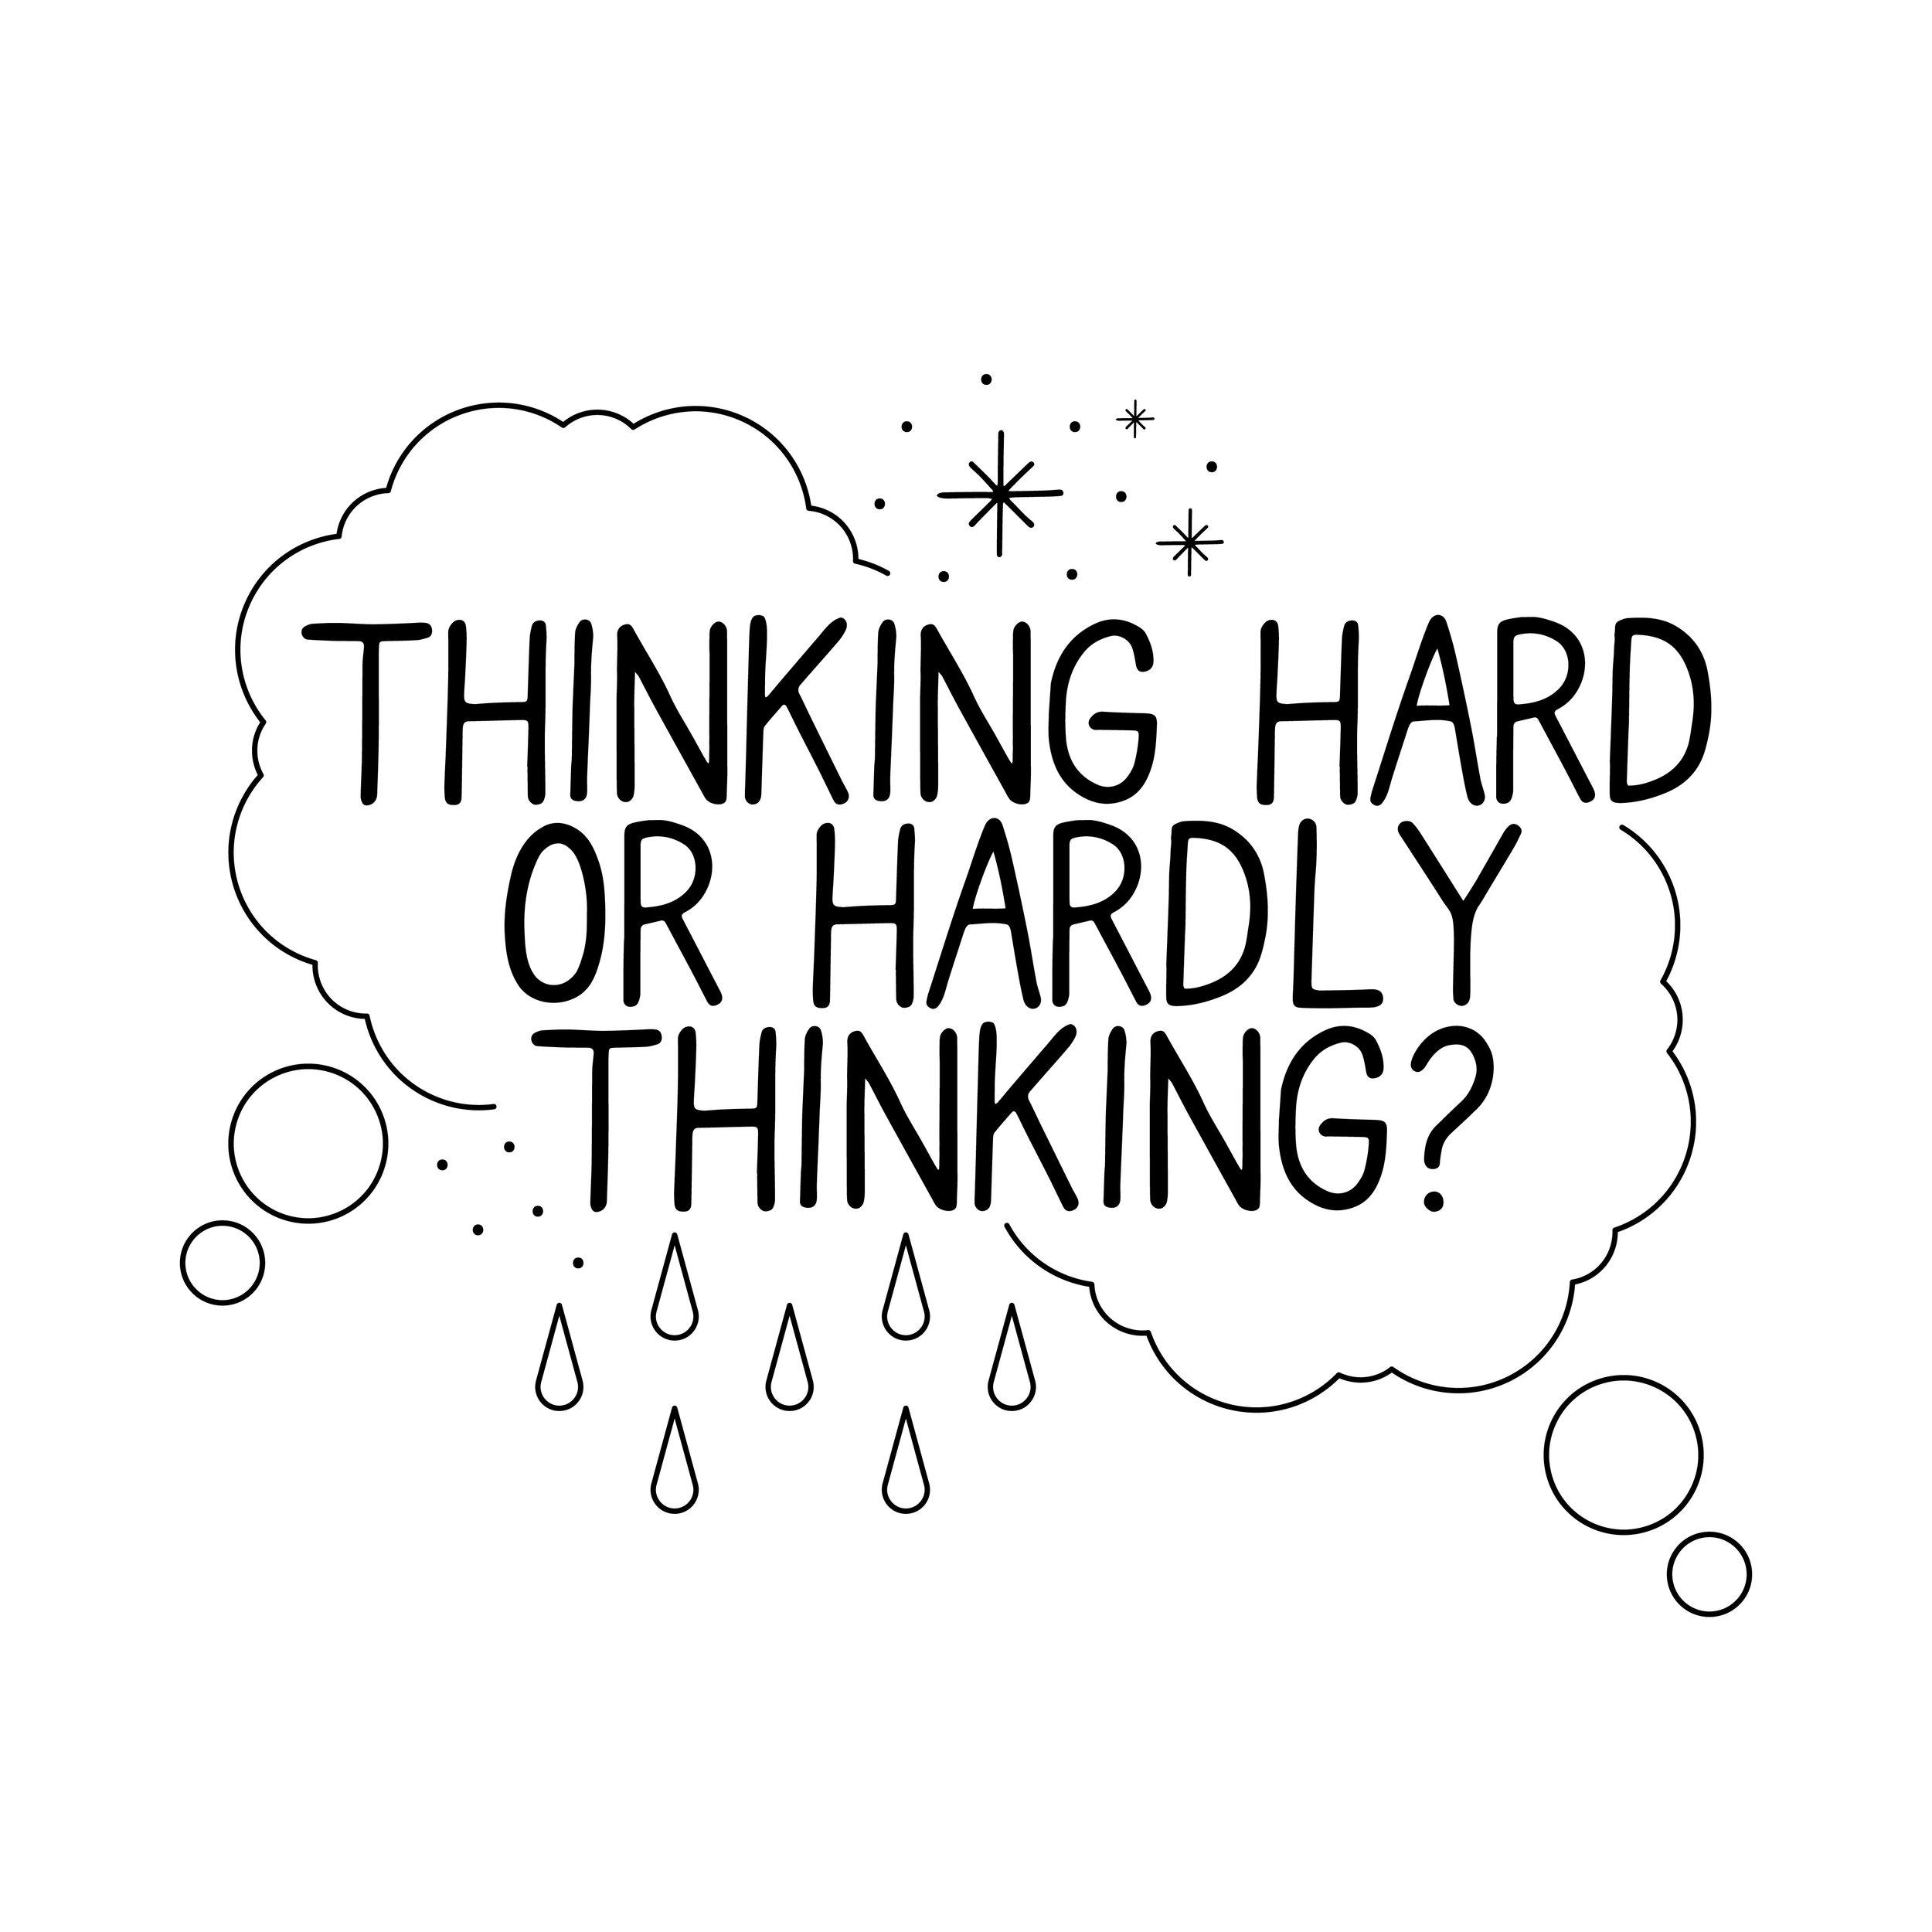 thinkinghard-01.jpg